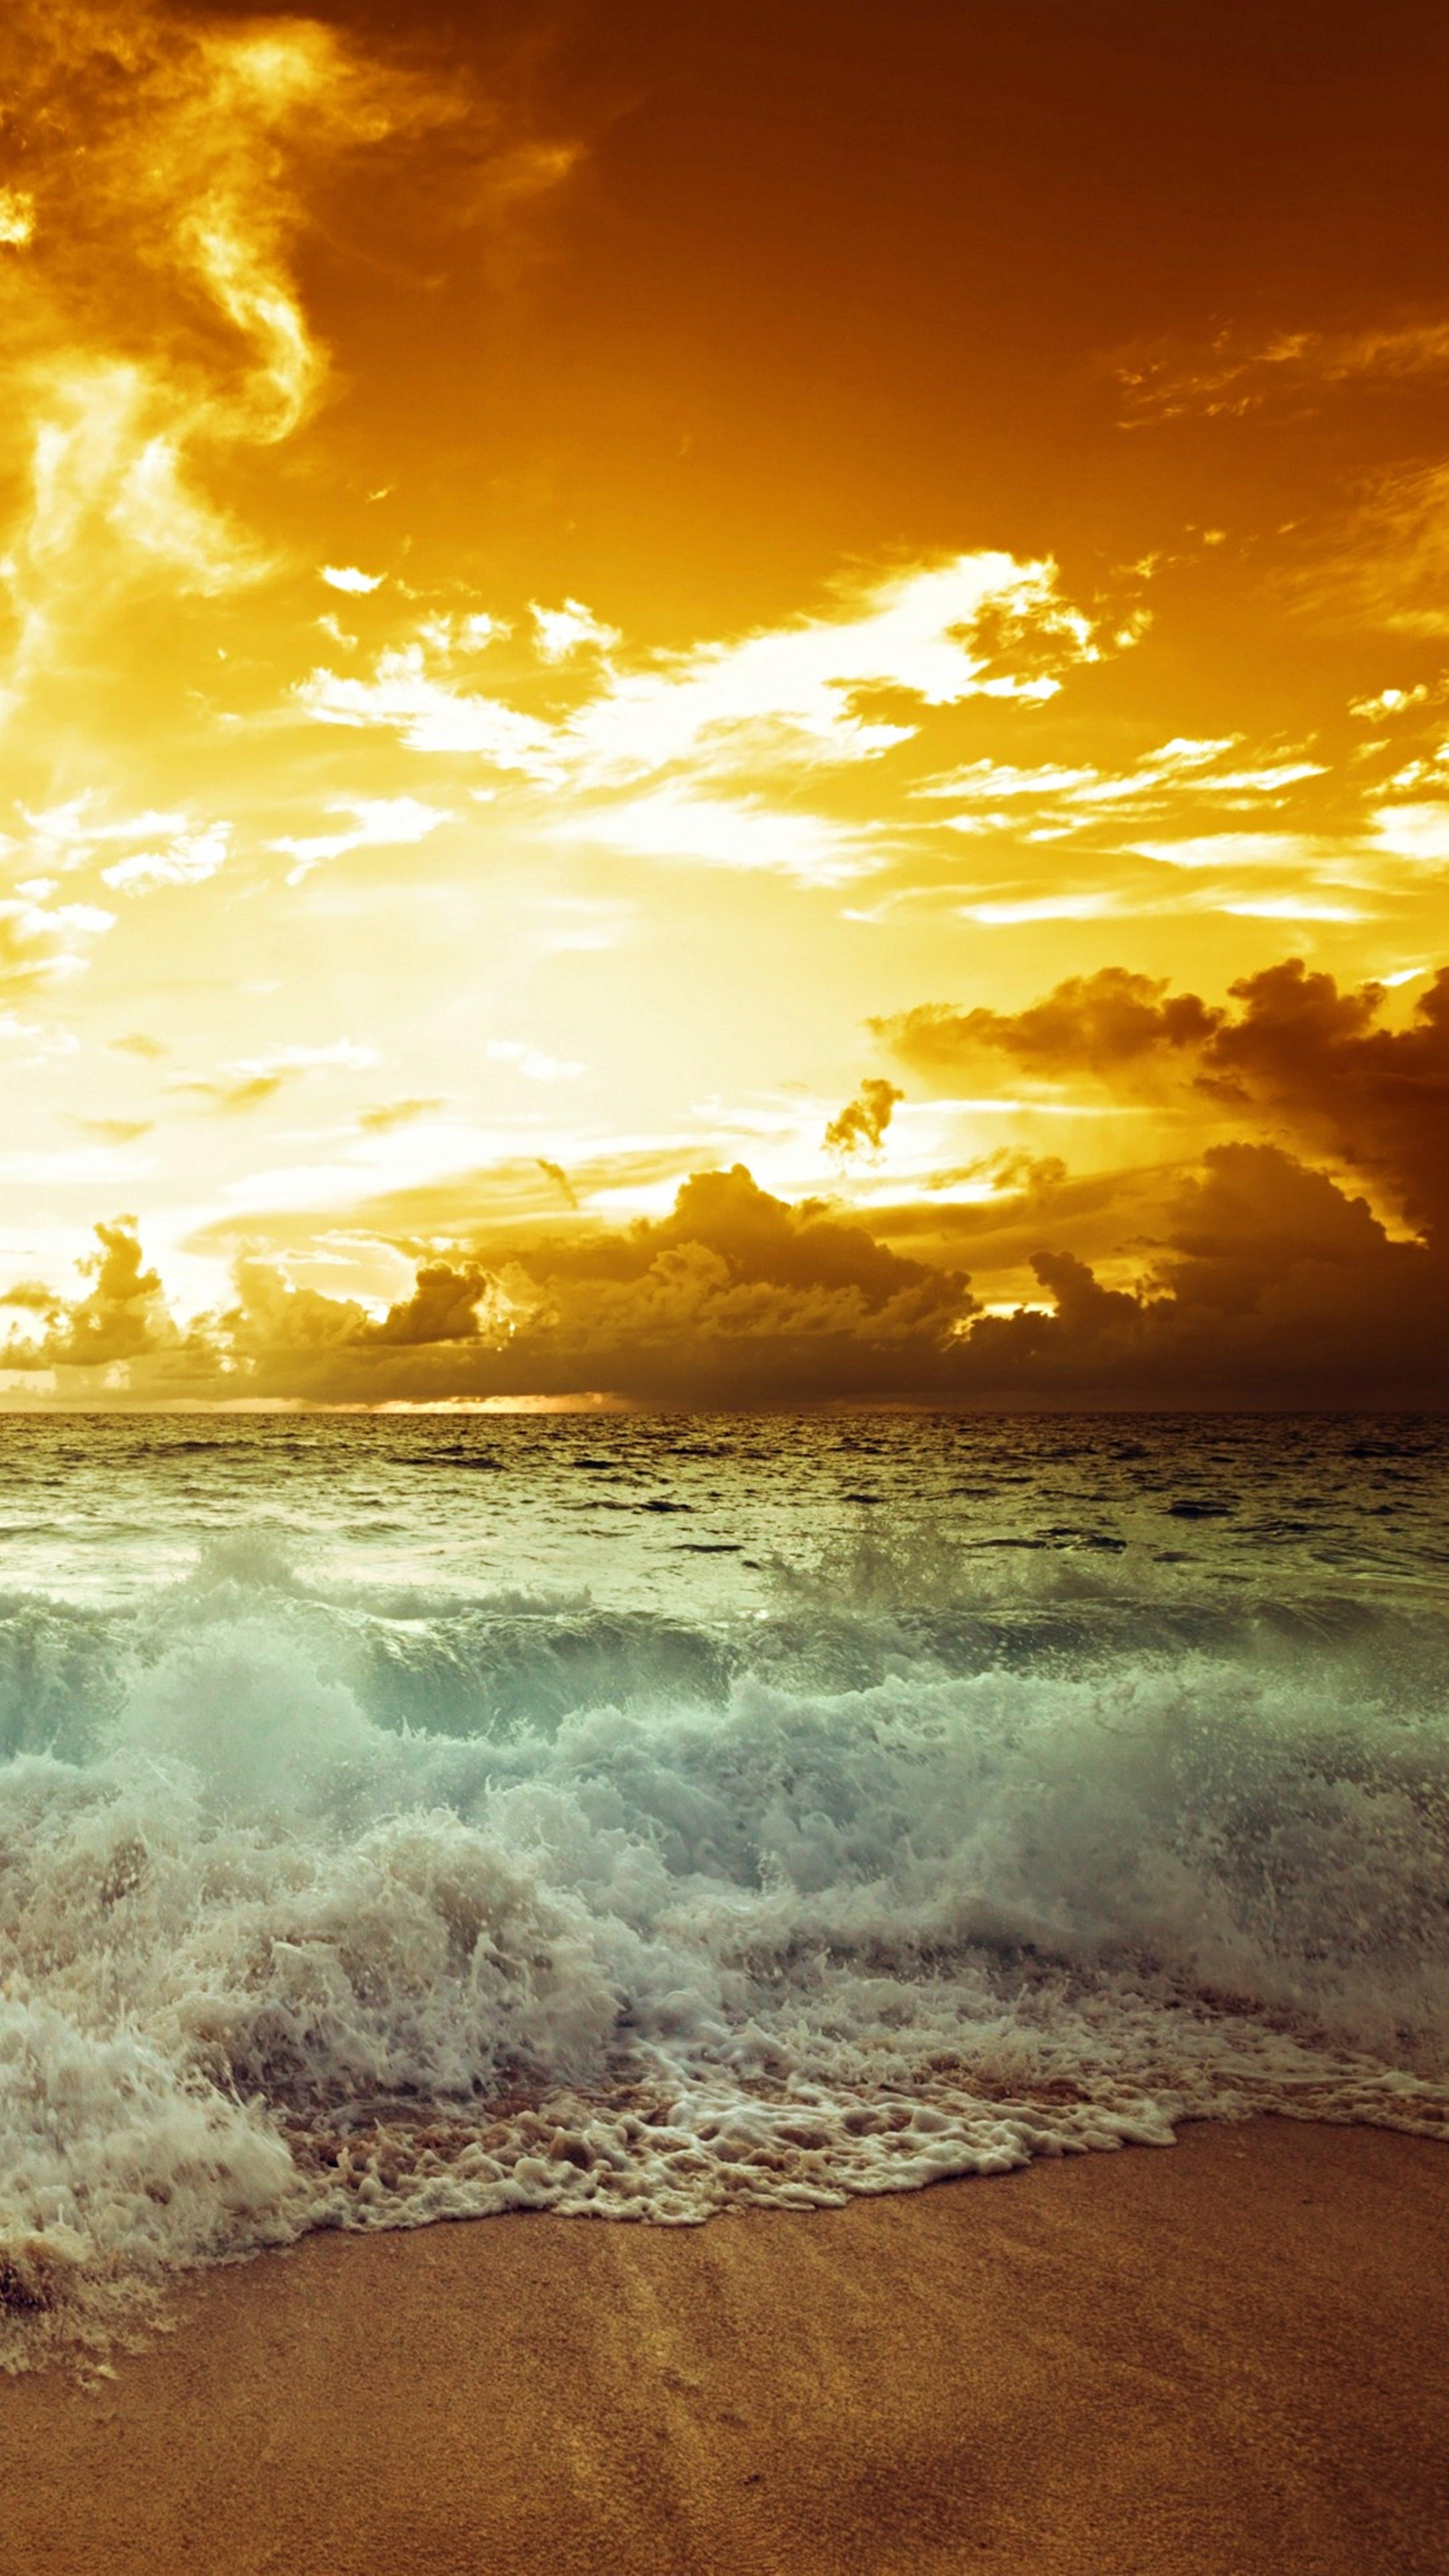 Sea waves sunset sky clouds landscape nature beaches wallpaper | 3840x6827 | 630867 | WallpaperUP